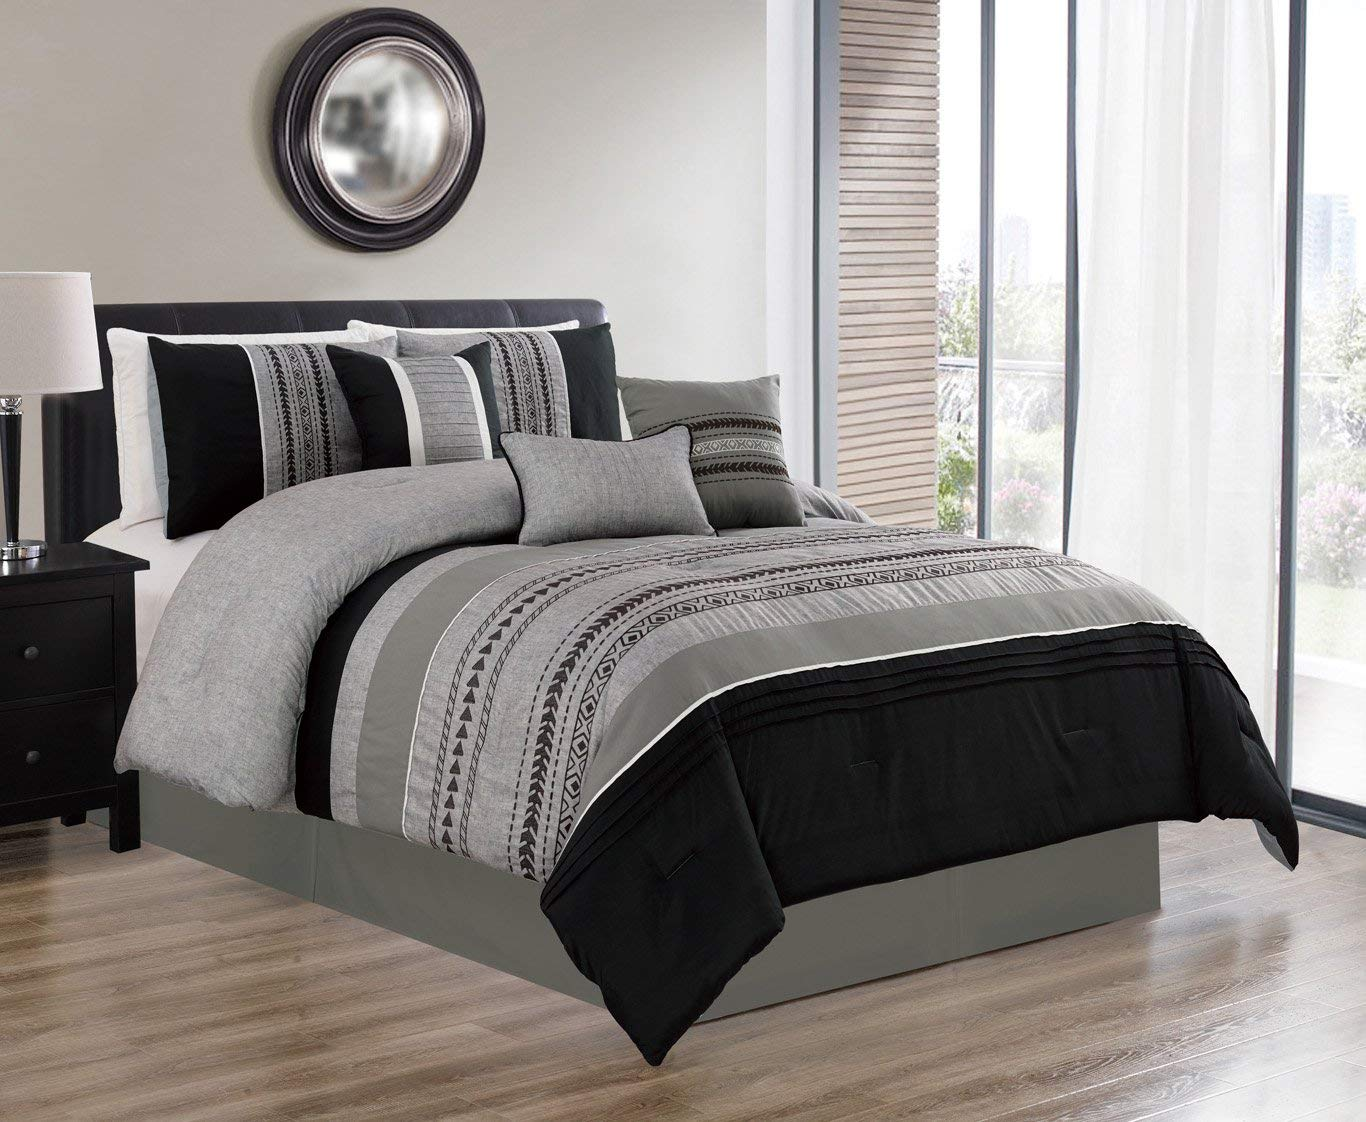 HGMart Bedding Comforter Set Bed In A Bag - 7 Piece Luxury ...